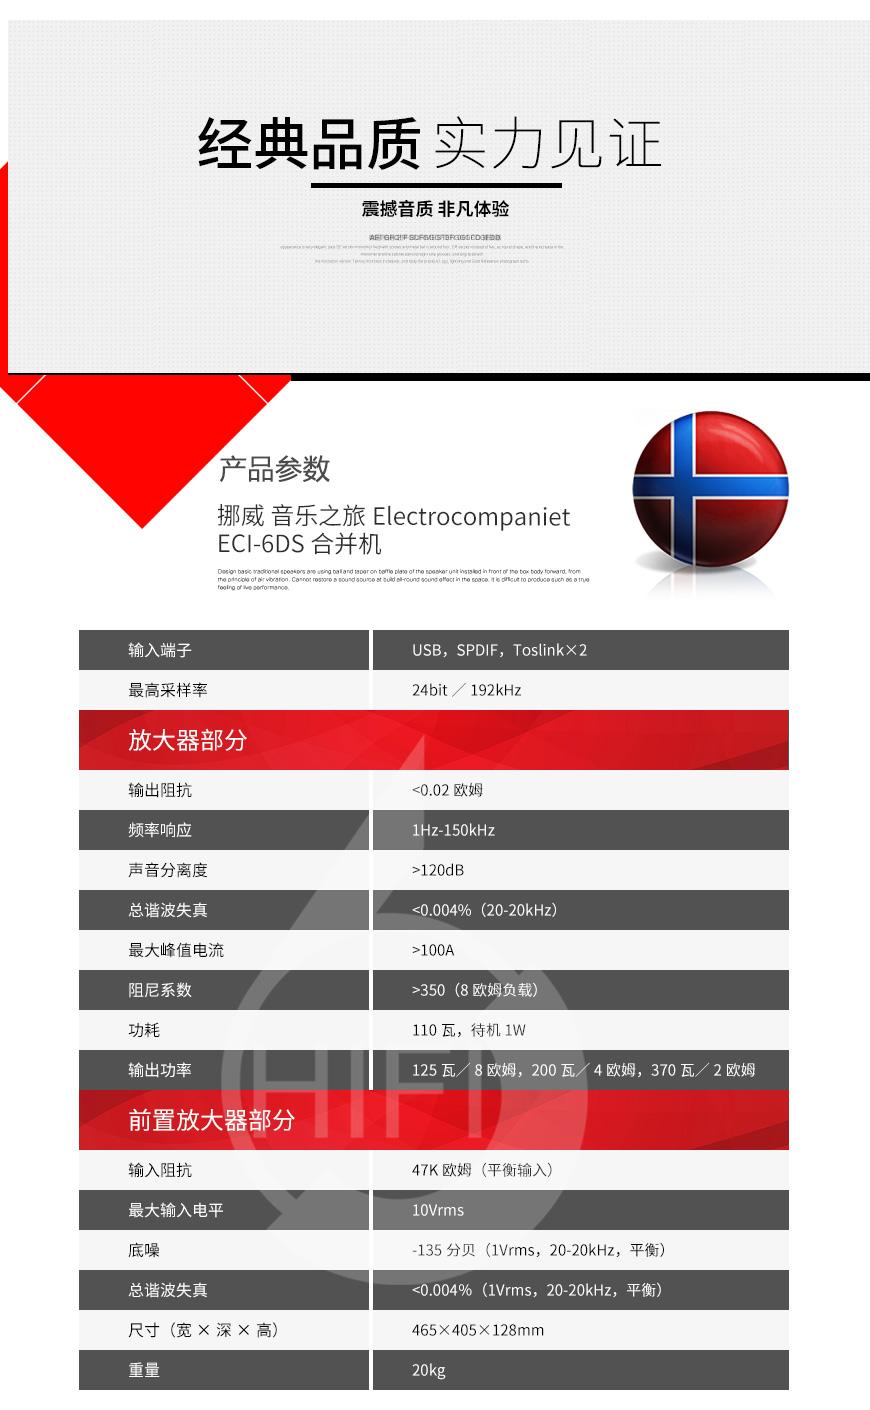 Electrocompaniet ECI-6DS,音乐之旅ECI-6DS合并机,挪威音乐之旅功放